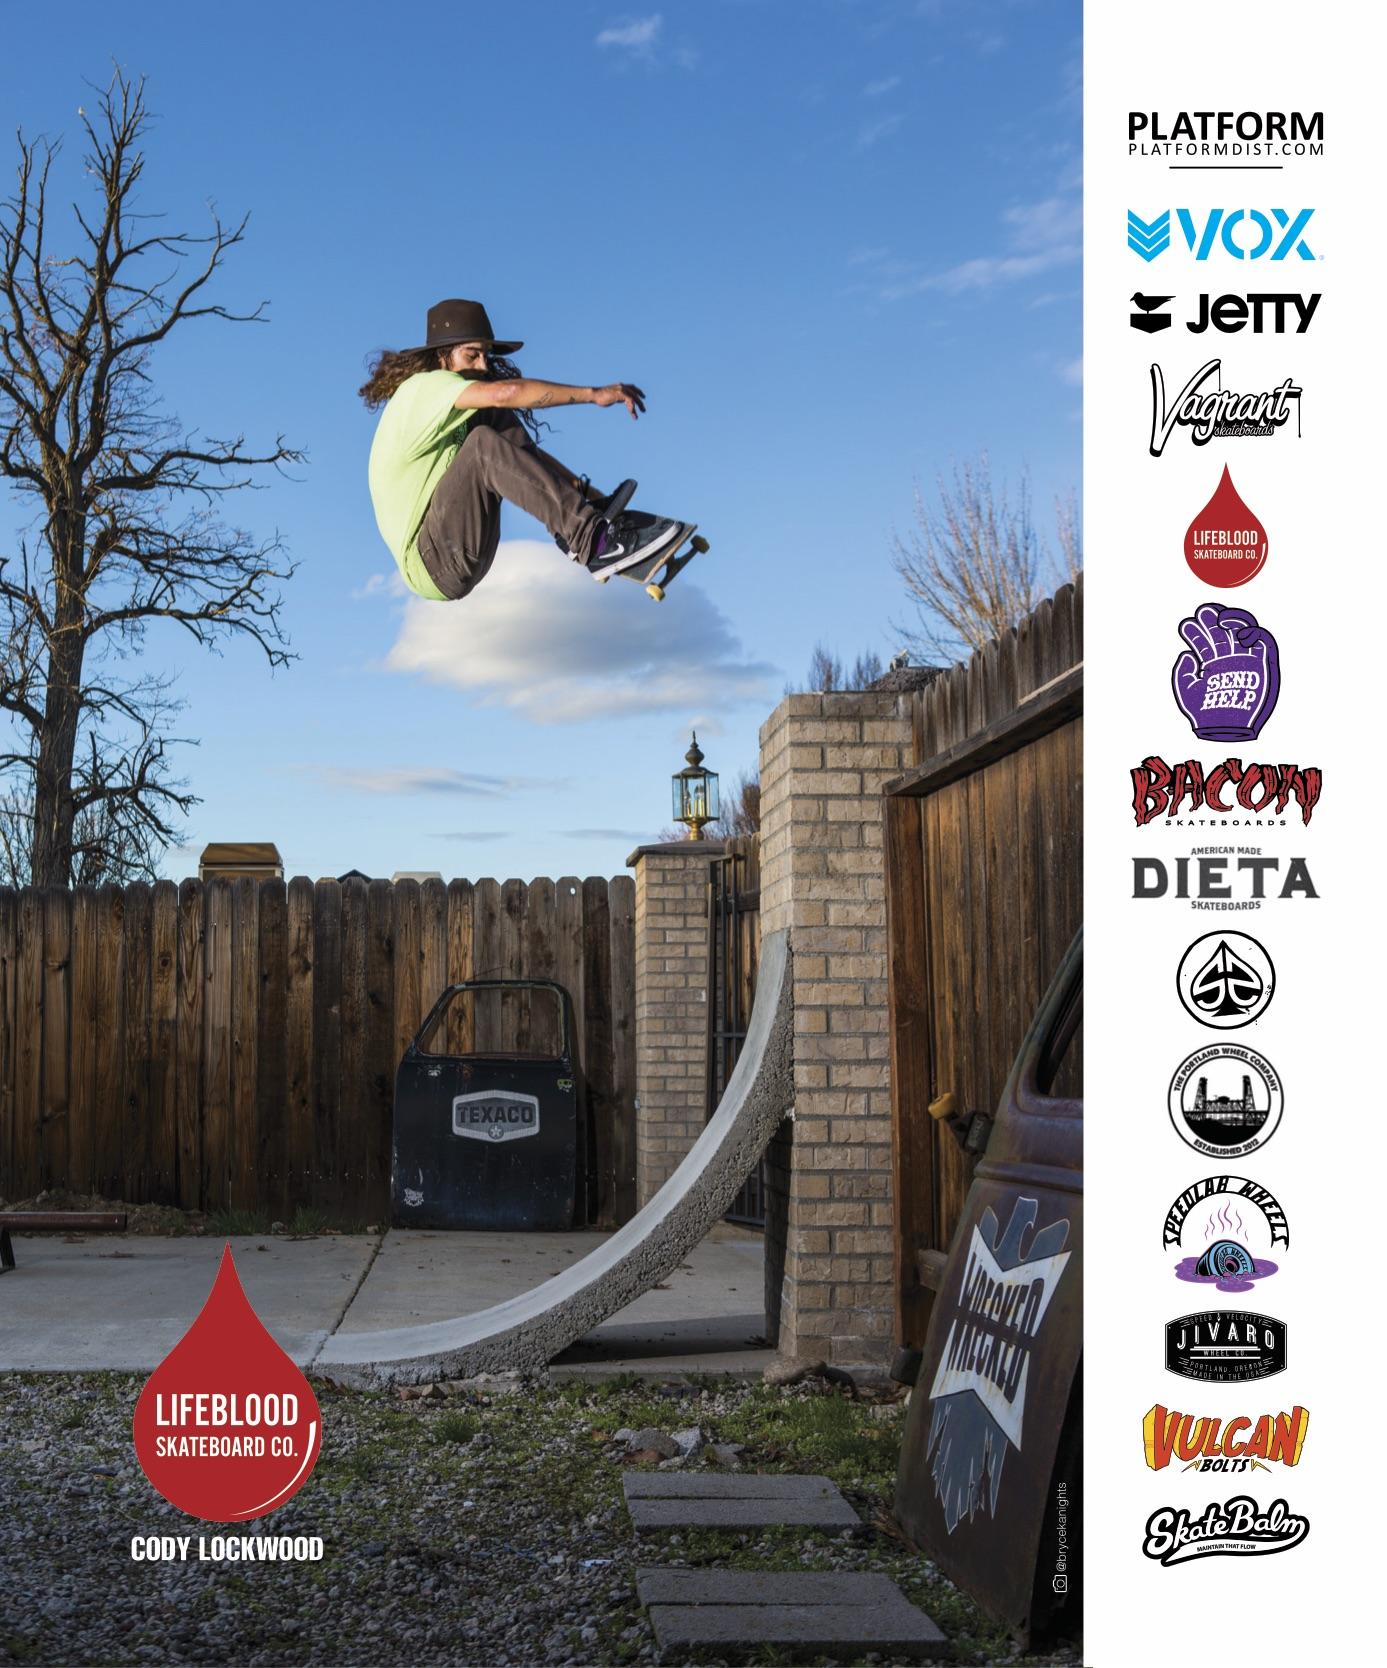 Lifeblood Skateboards ad from King Skate mag